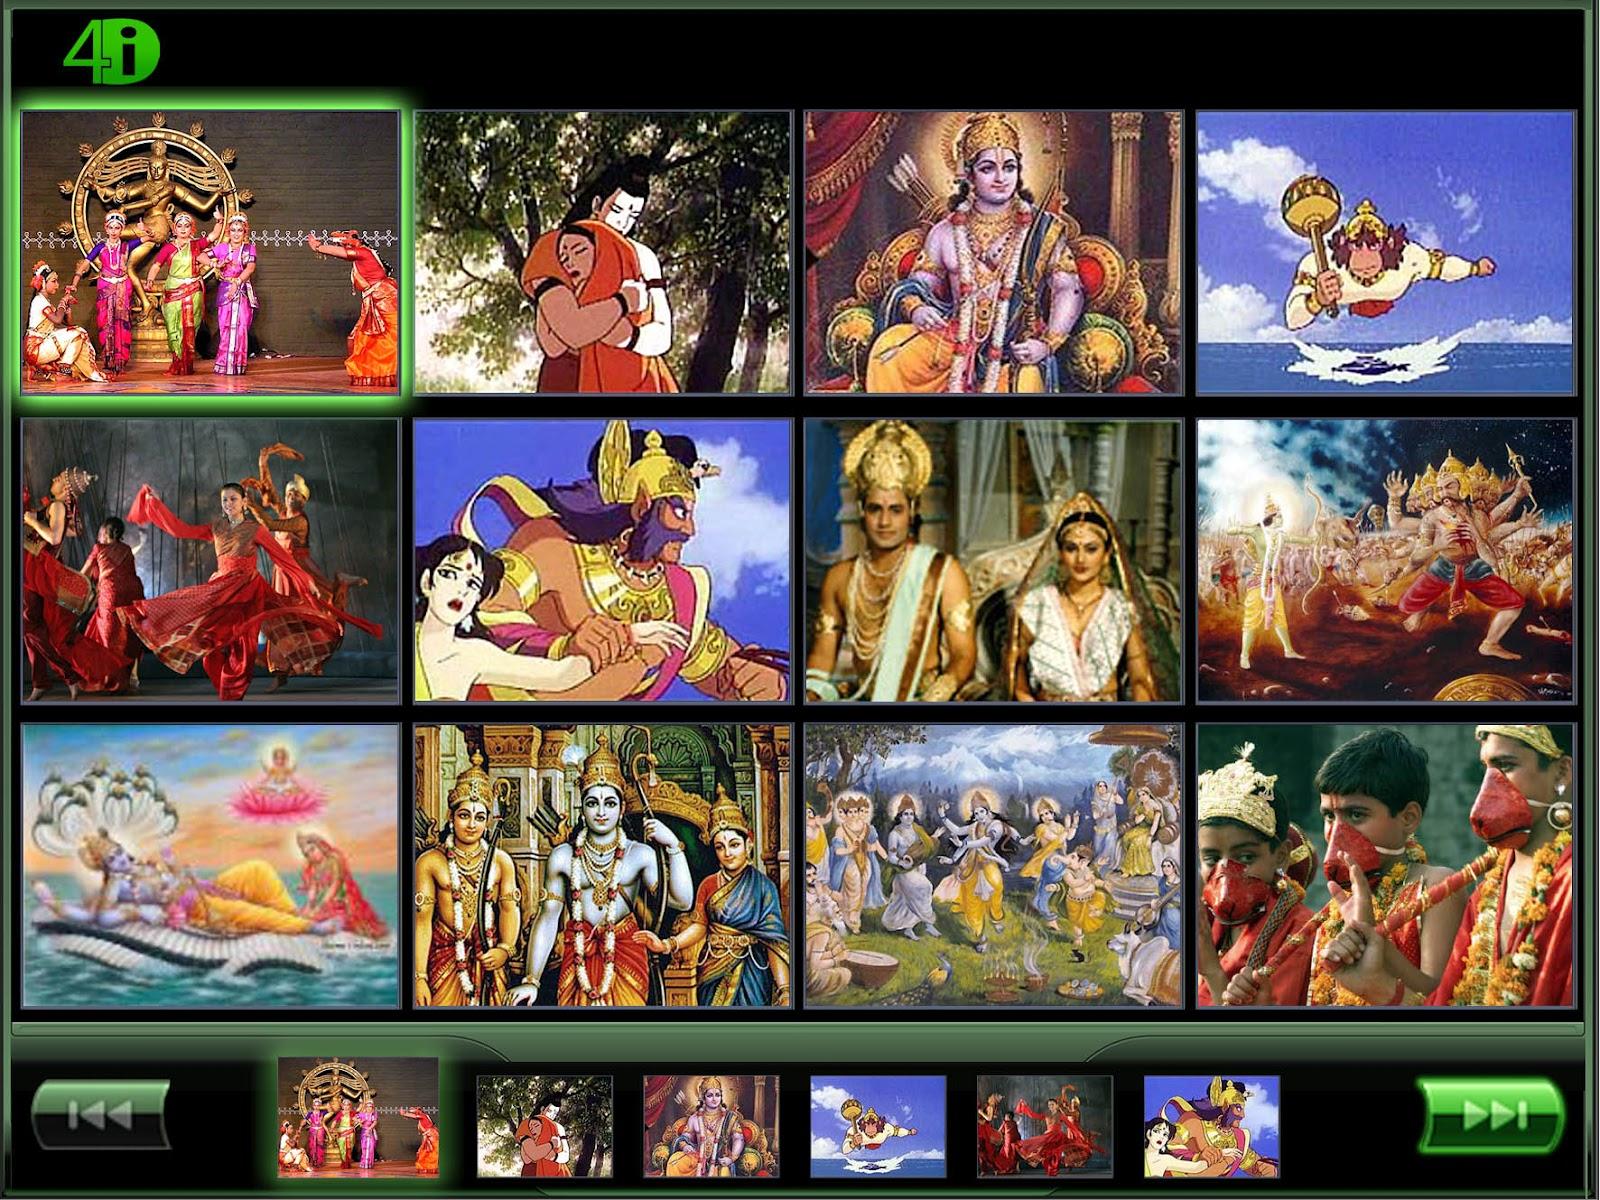 Kamba Ramayanam in English: Index of Kamba Ramayana in English